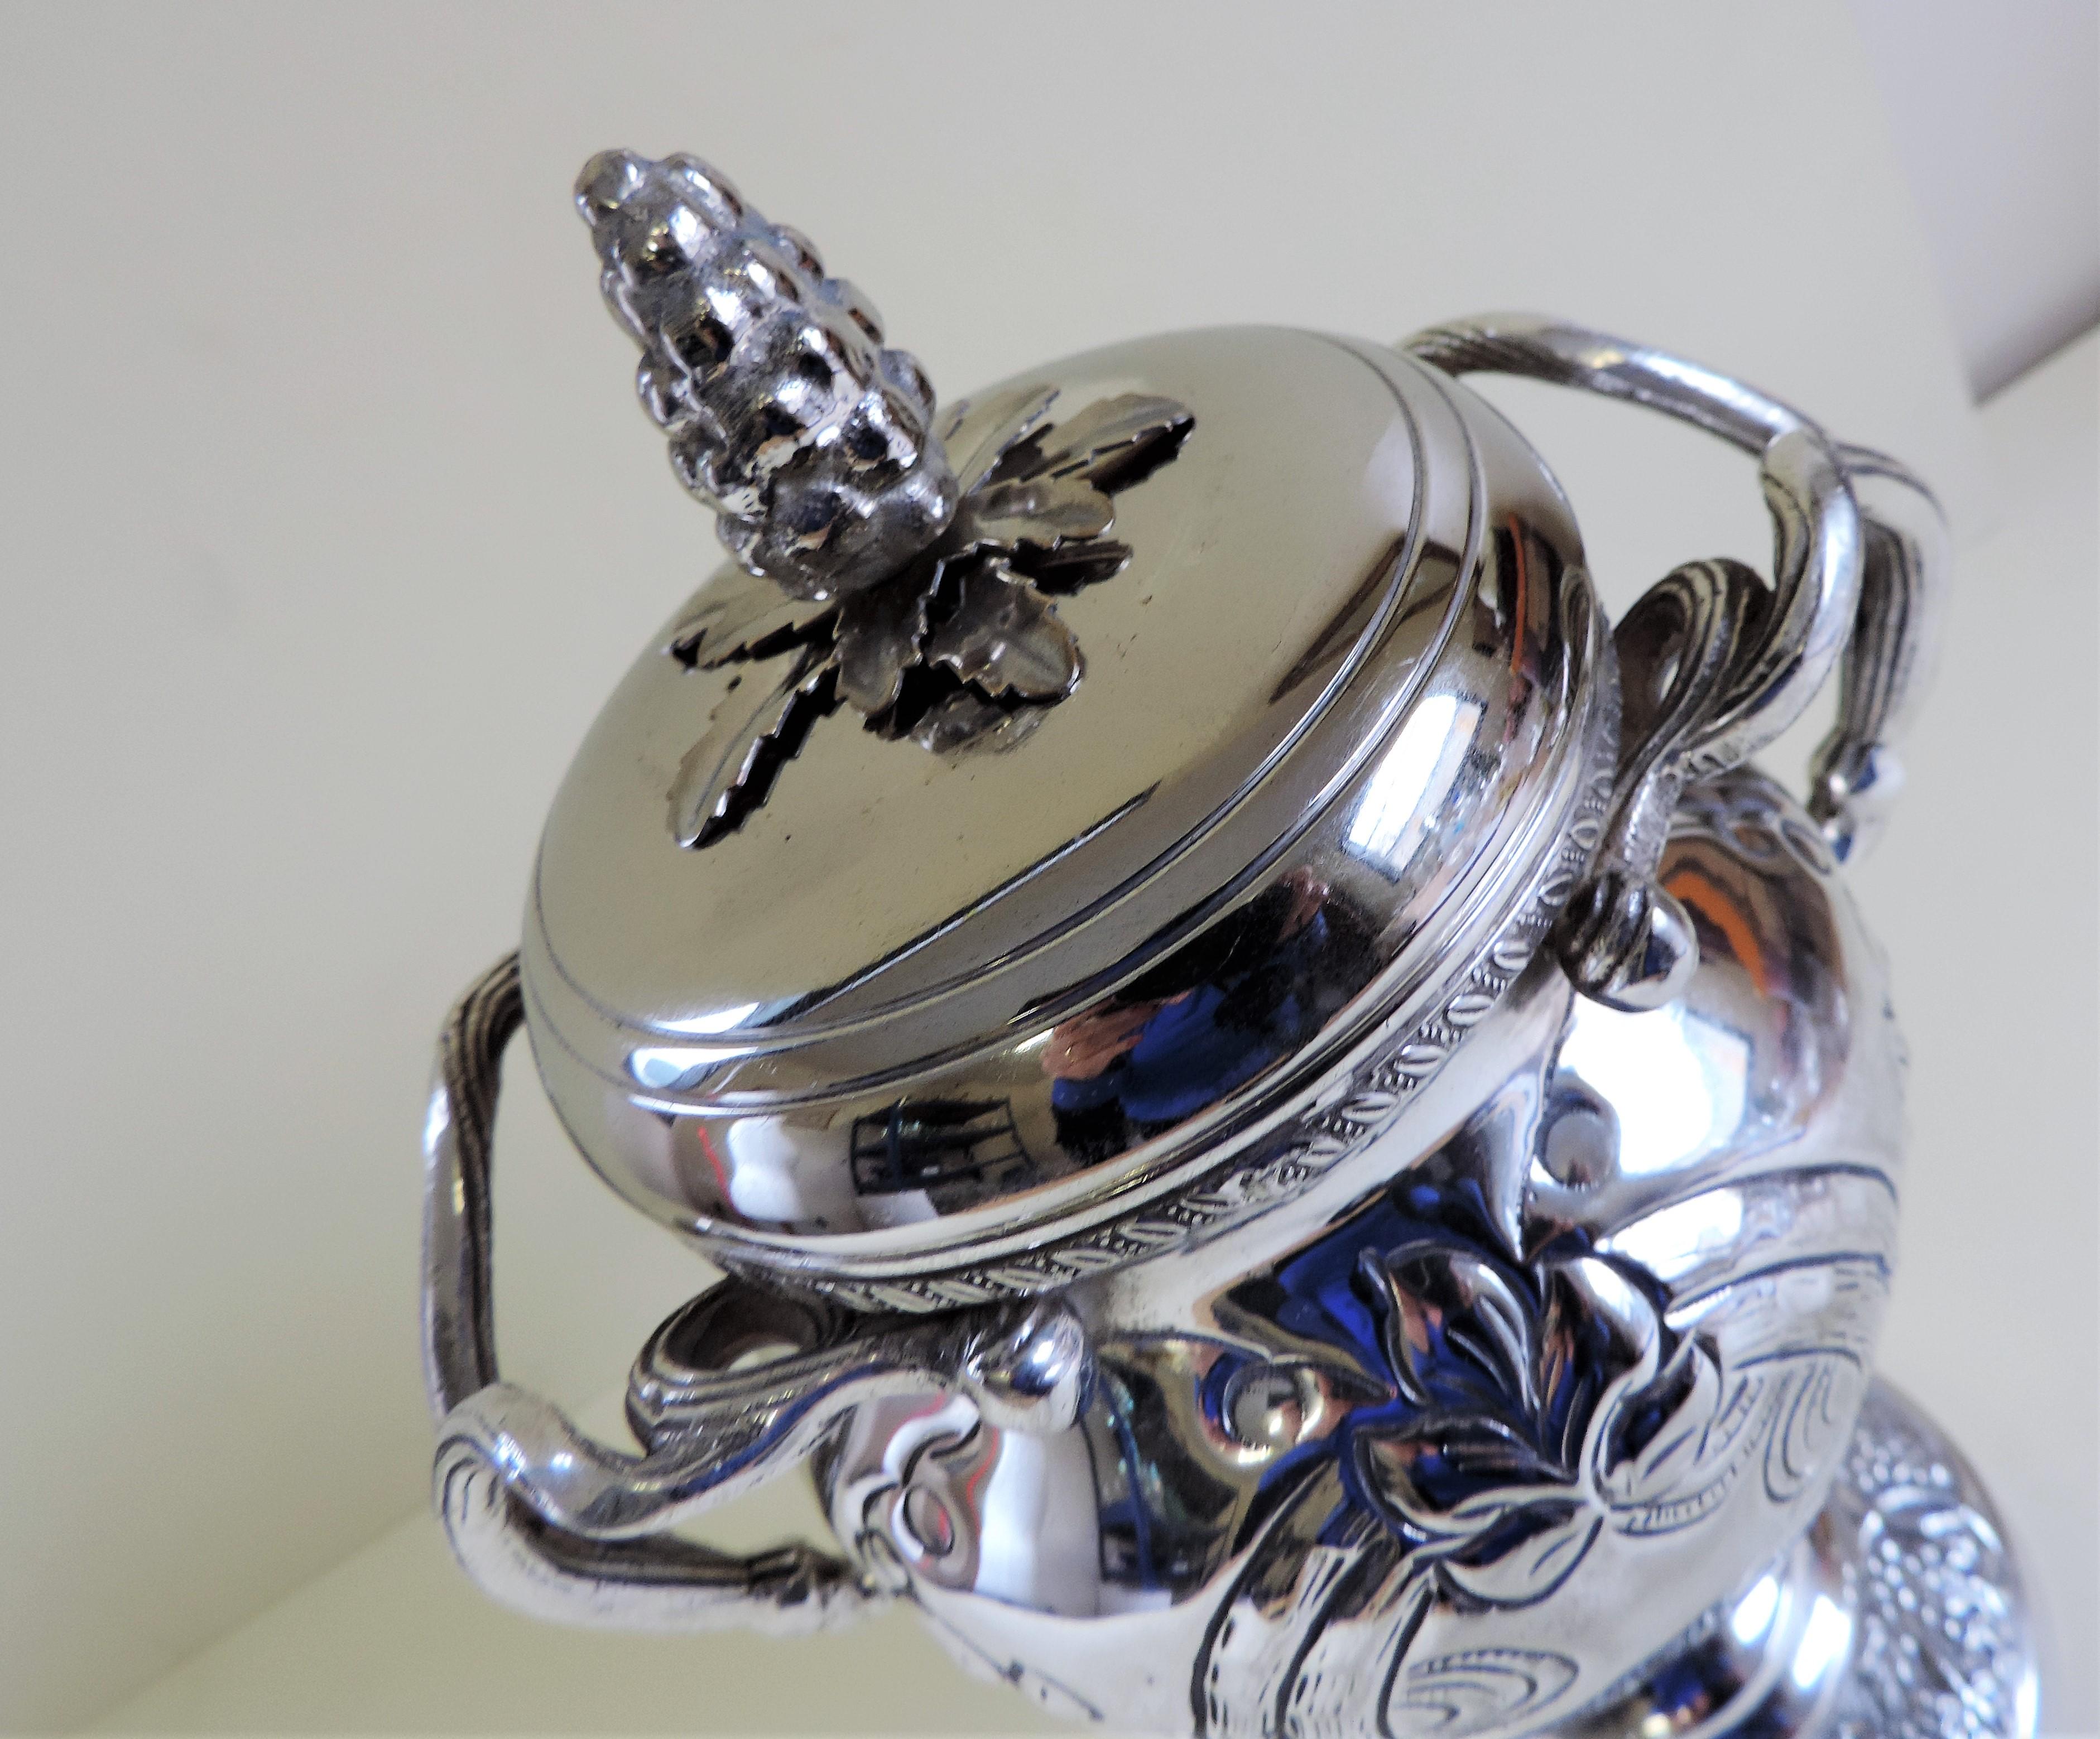 Antique Silver Plate Lidded Urn - Image 3 of 6